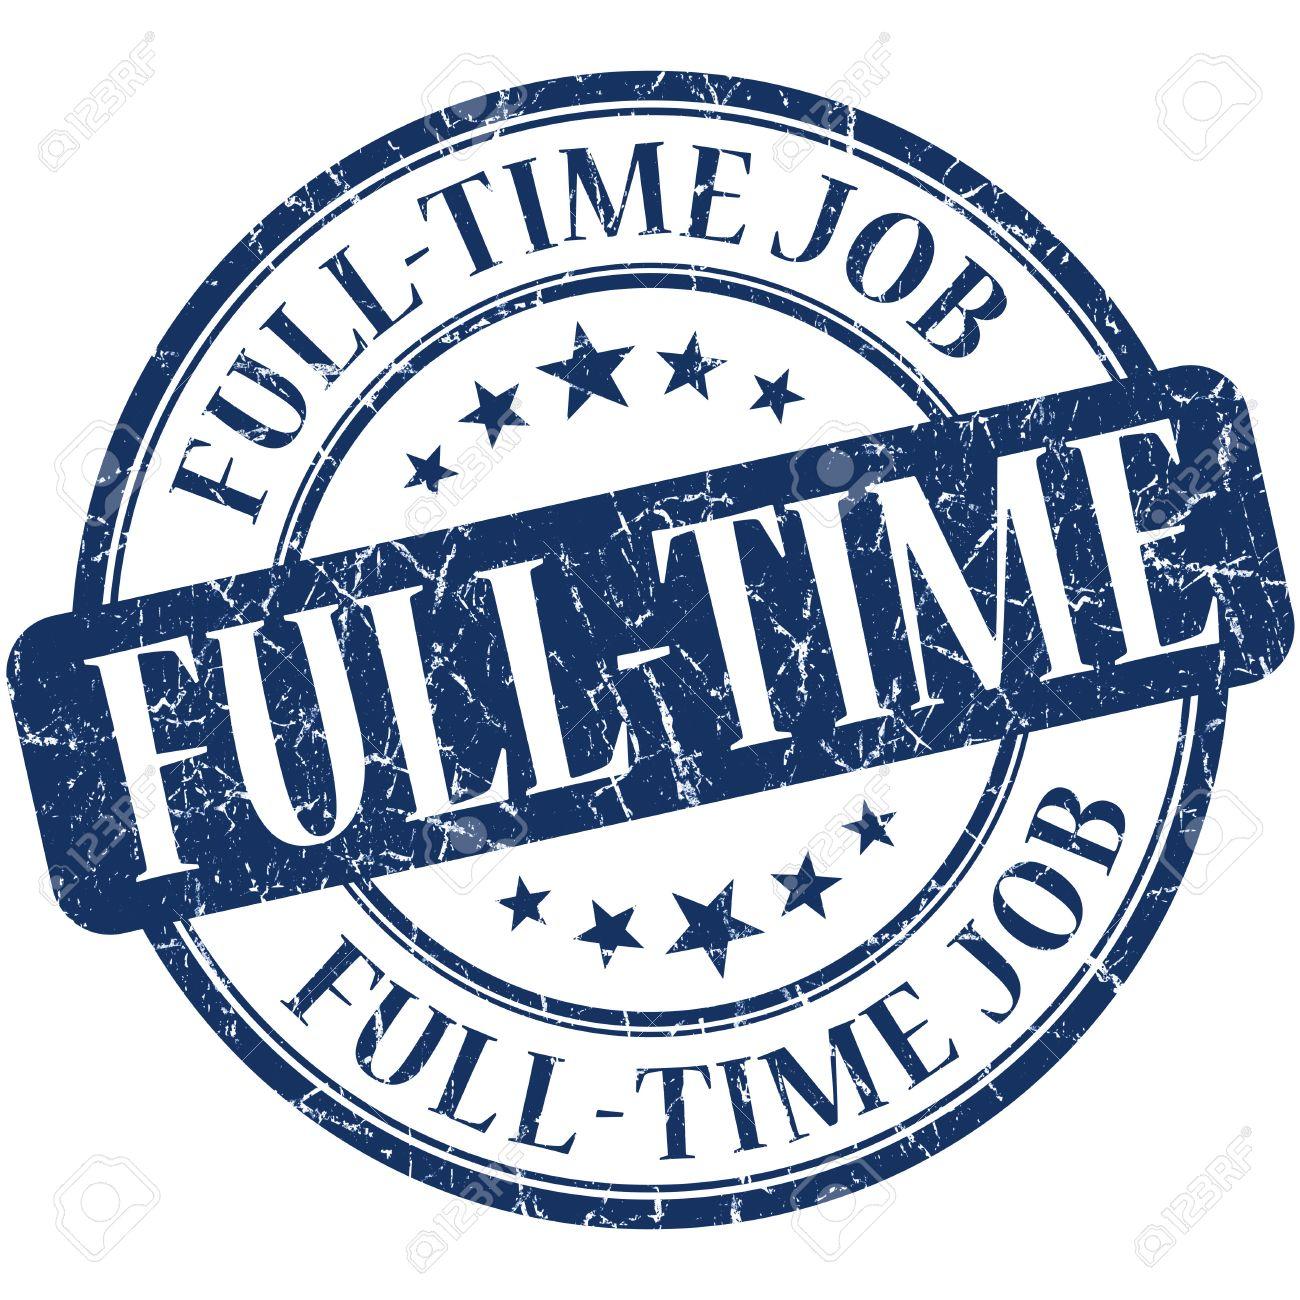 Image result for full-time job